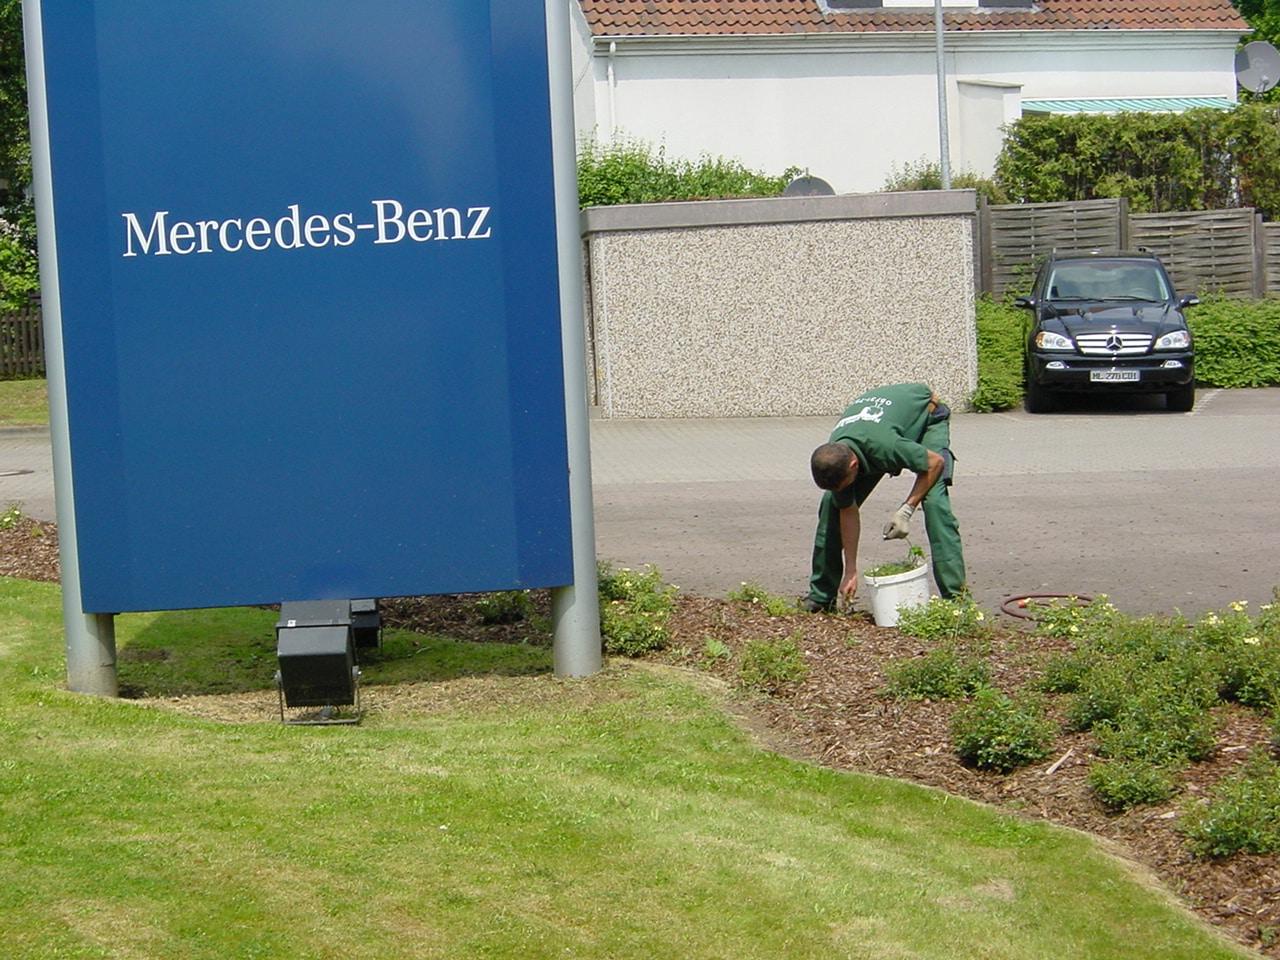 Gartenpflege an Gewerbeobjekten Bad Oeynhausen